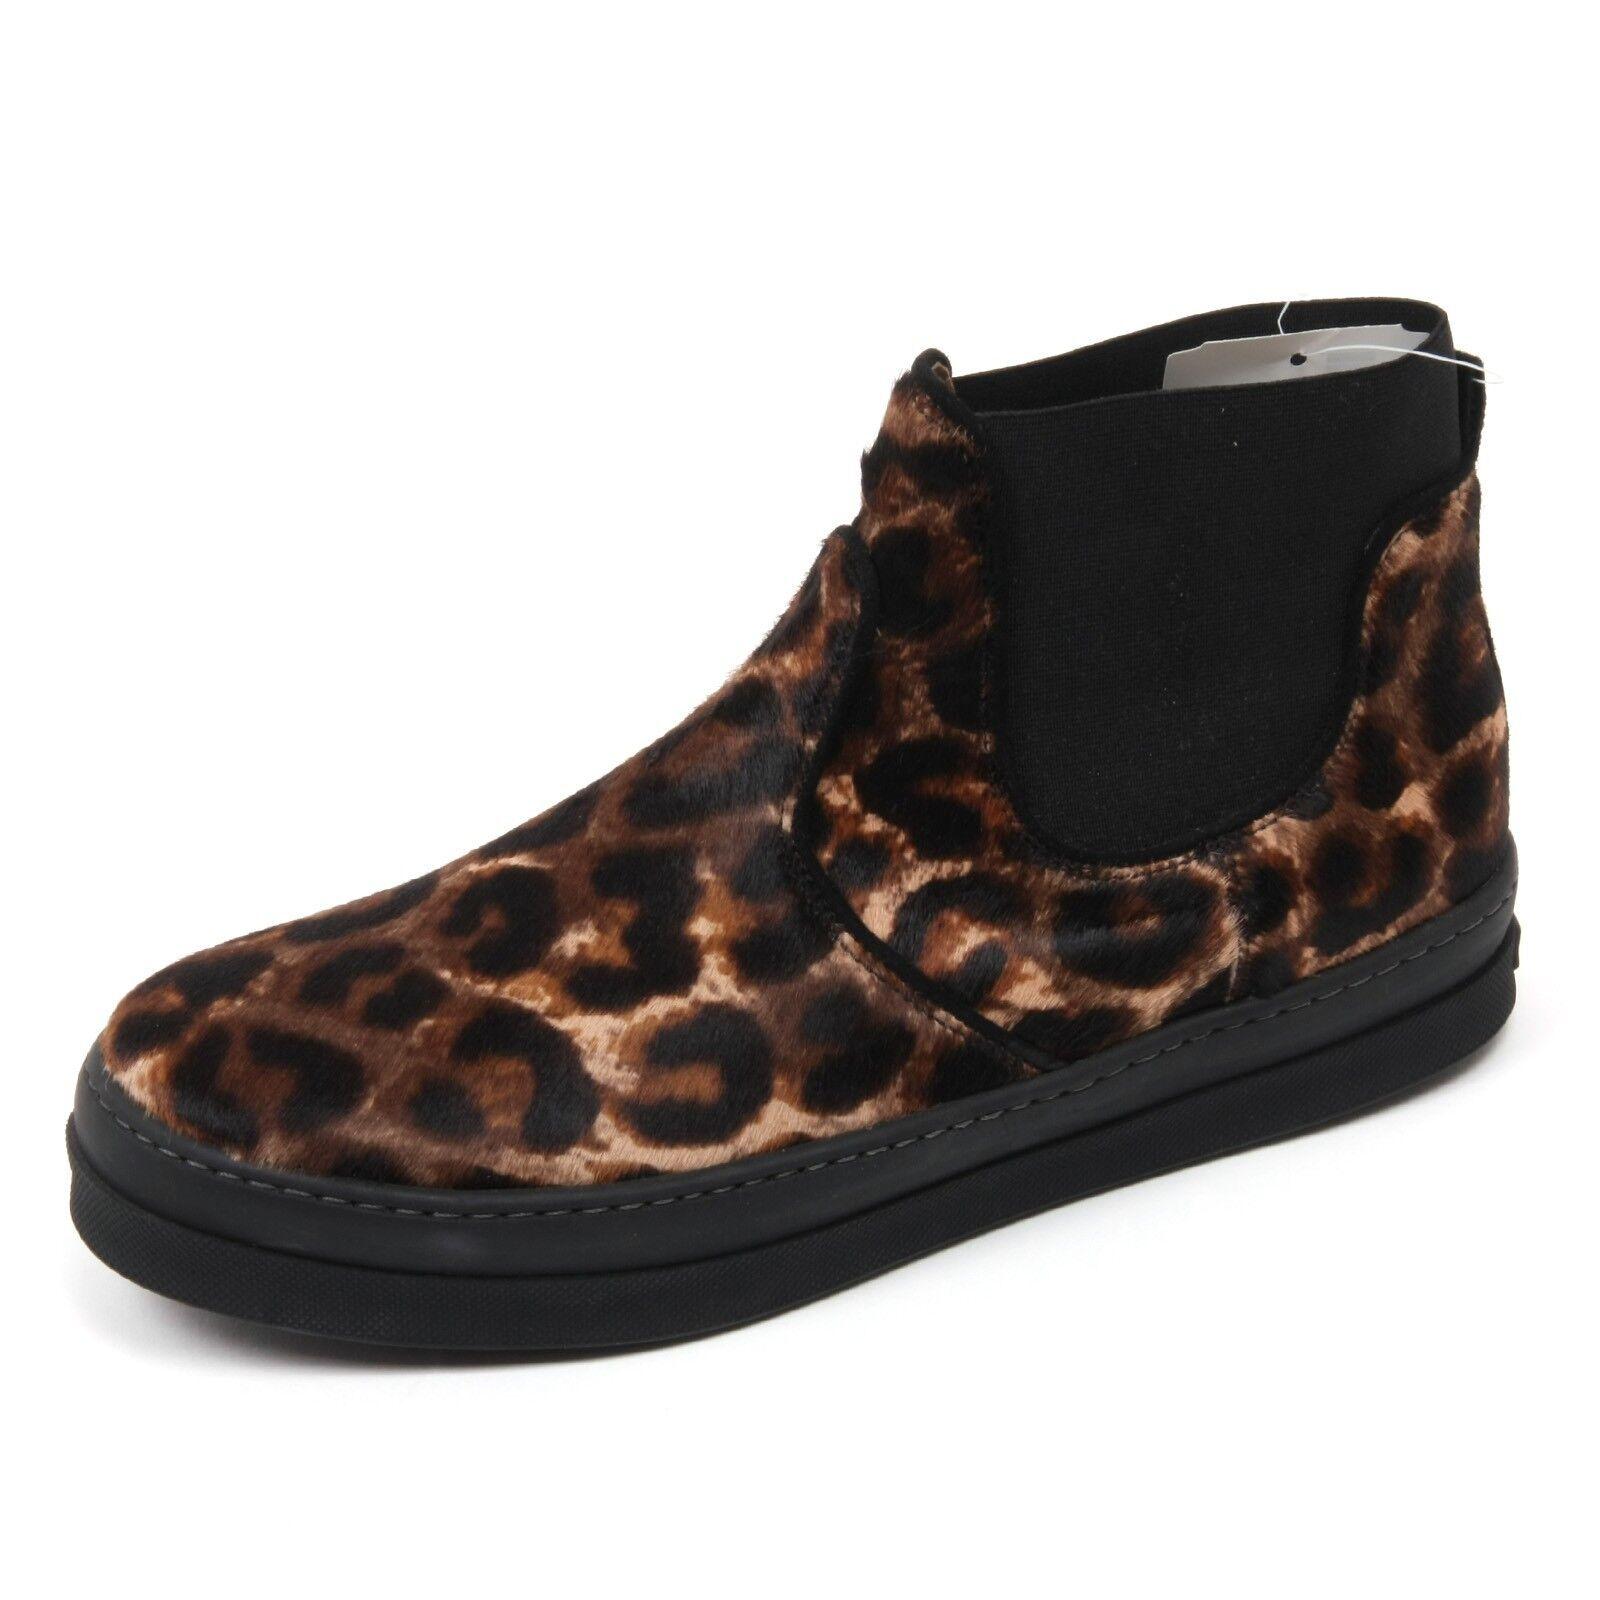 C2212 C2212 C2212 Tronchetto mujer UNISA Cusco Scarpa Maculato Zapato bota mujer  diseñador en linea